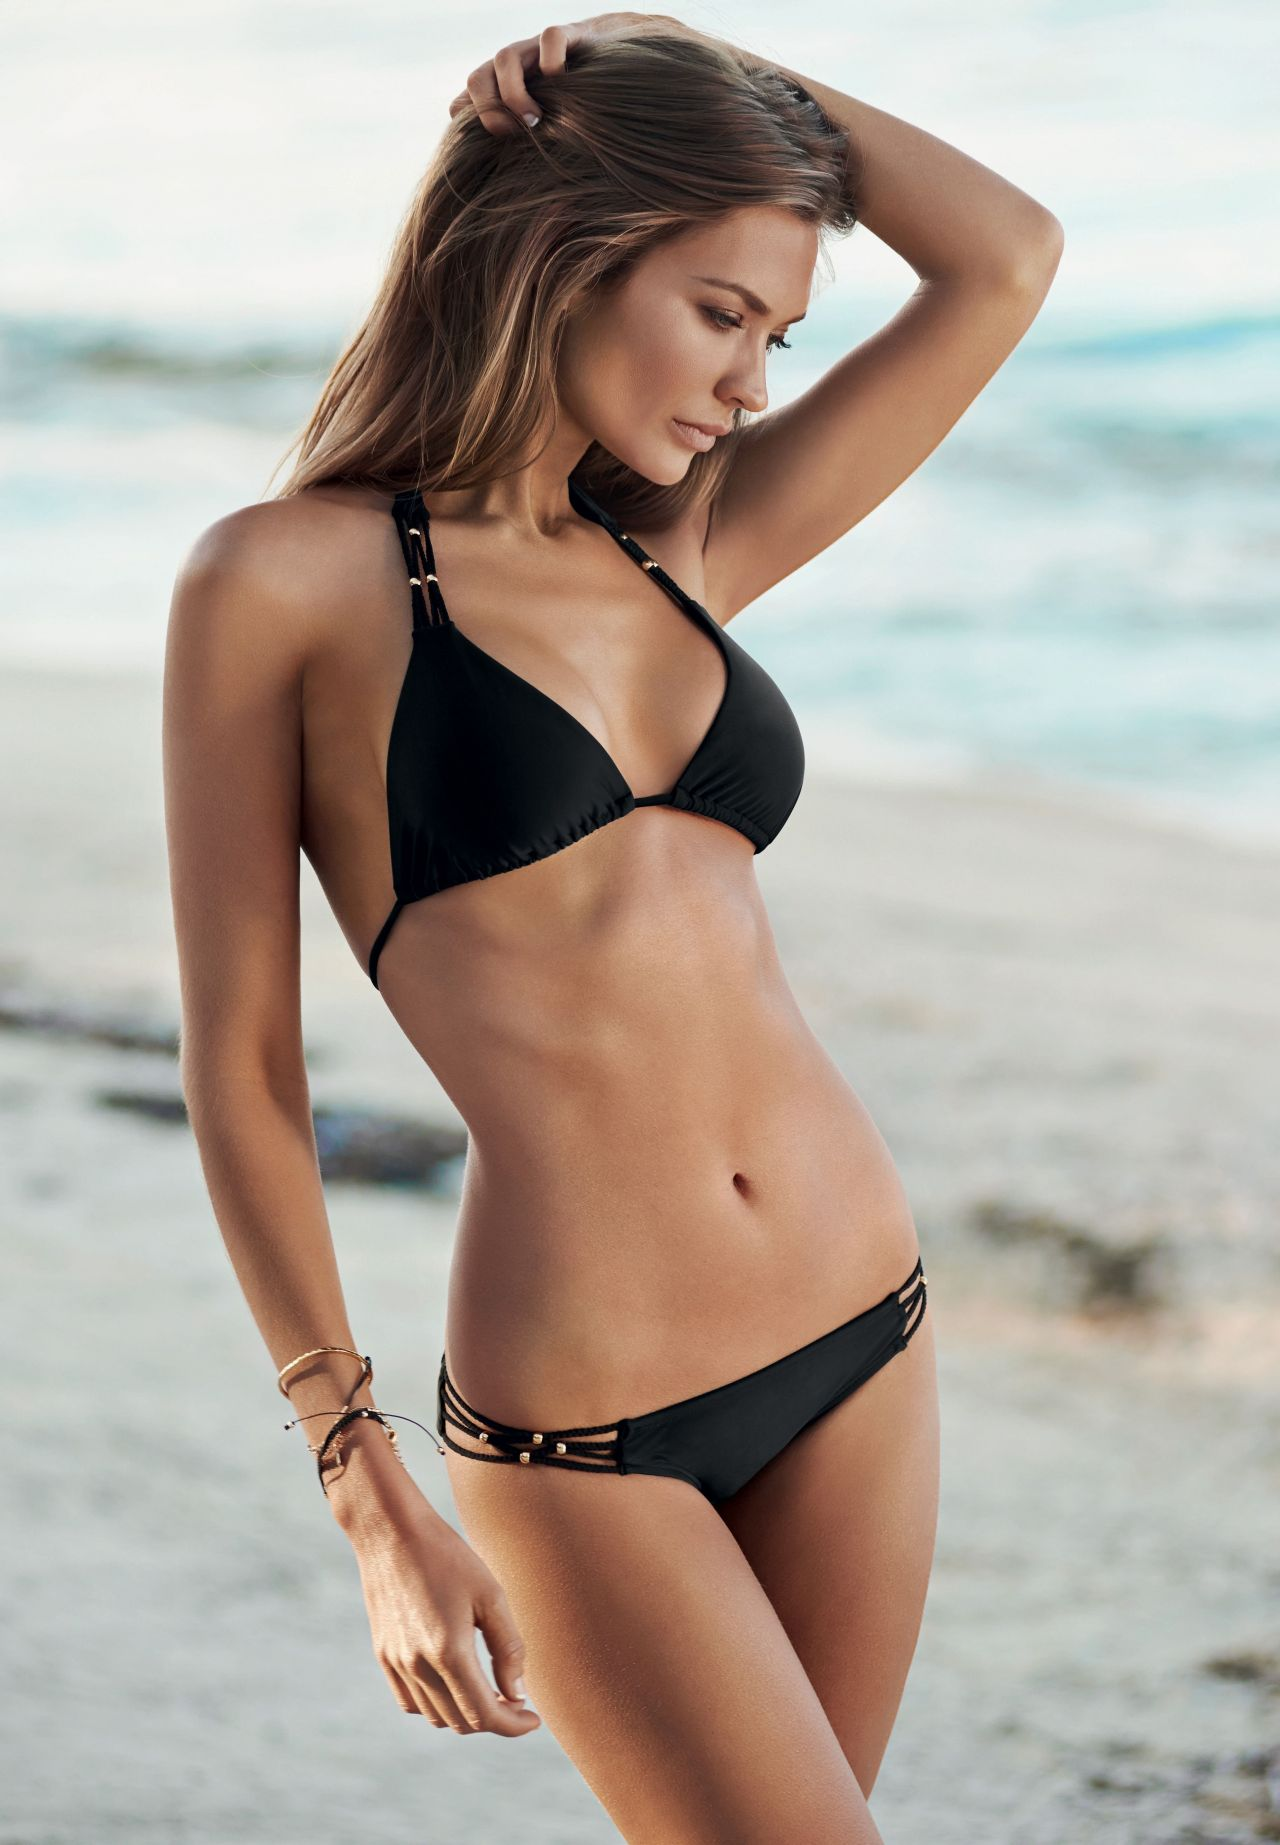 Amber Arbucci Photoshoot for Pily Q Resort Swimwear 2014 бар рафаэли